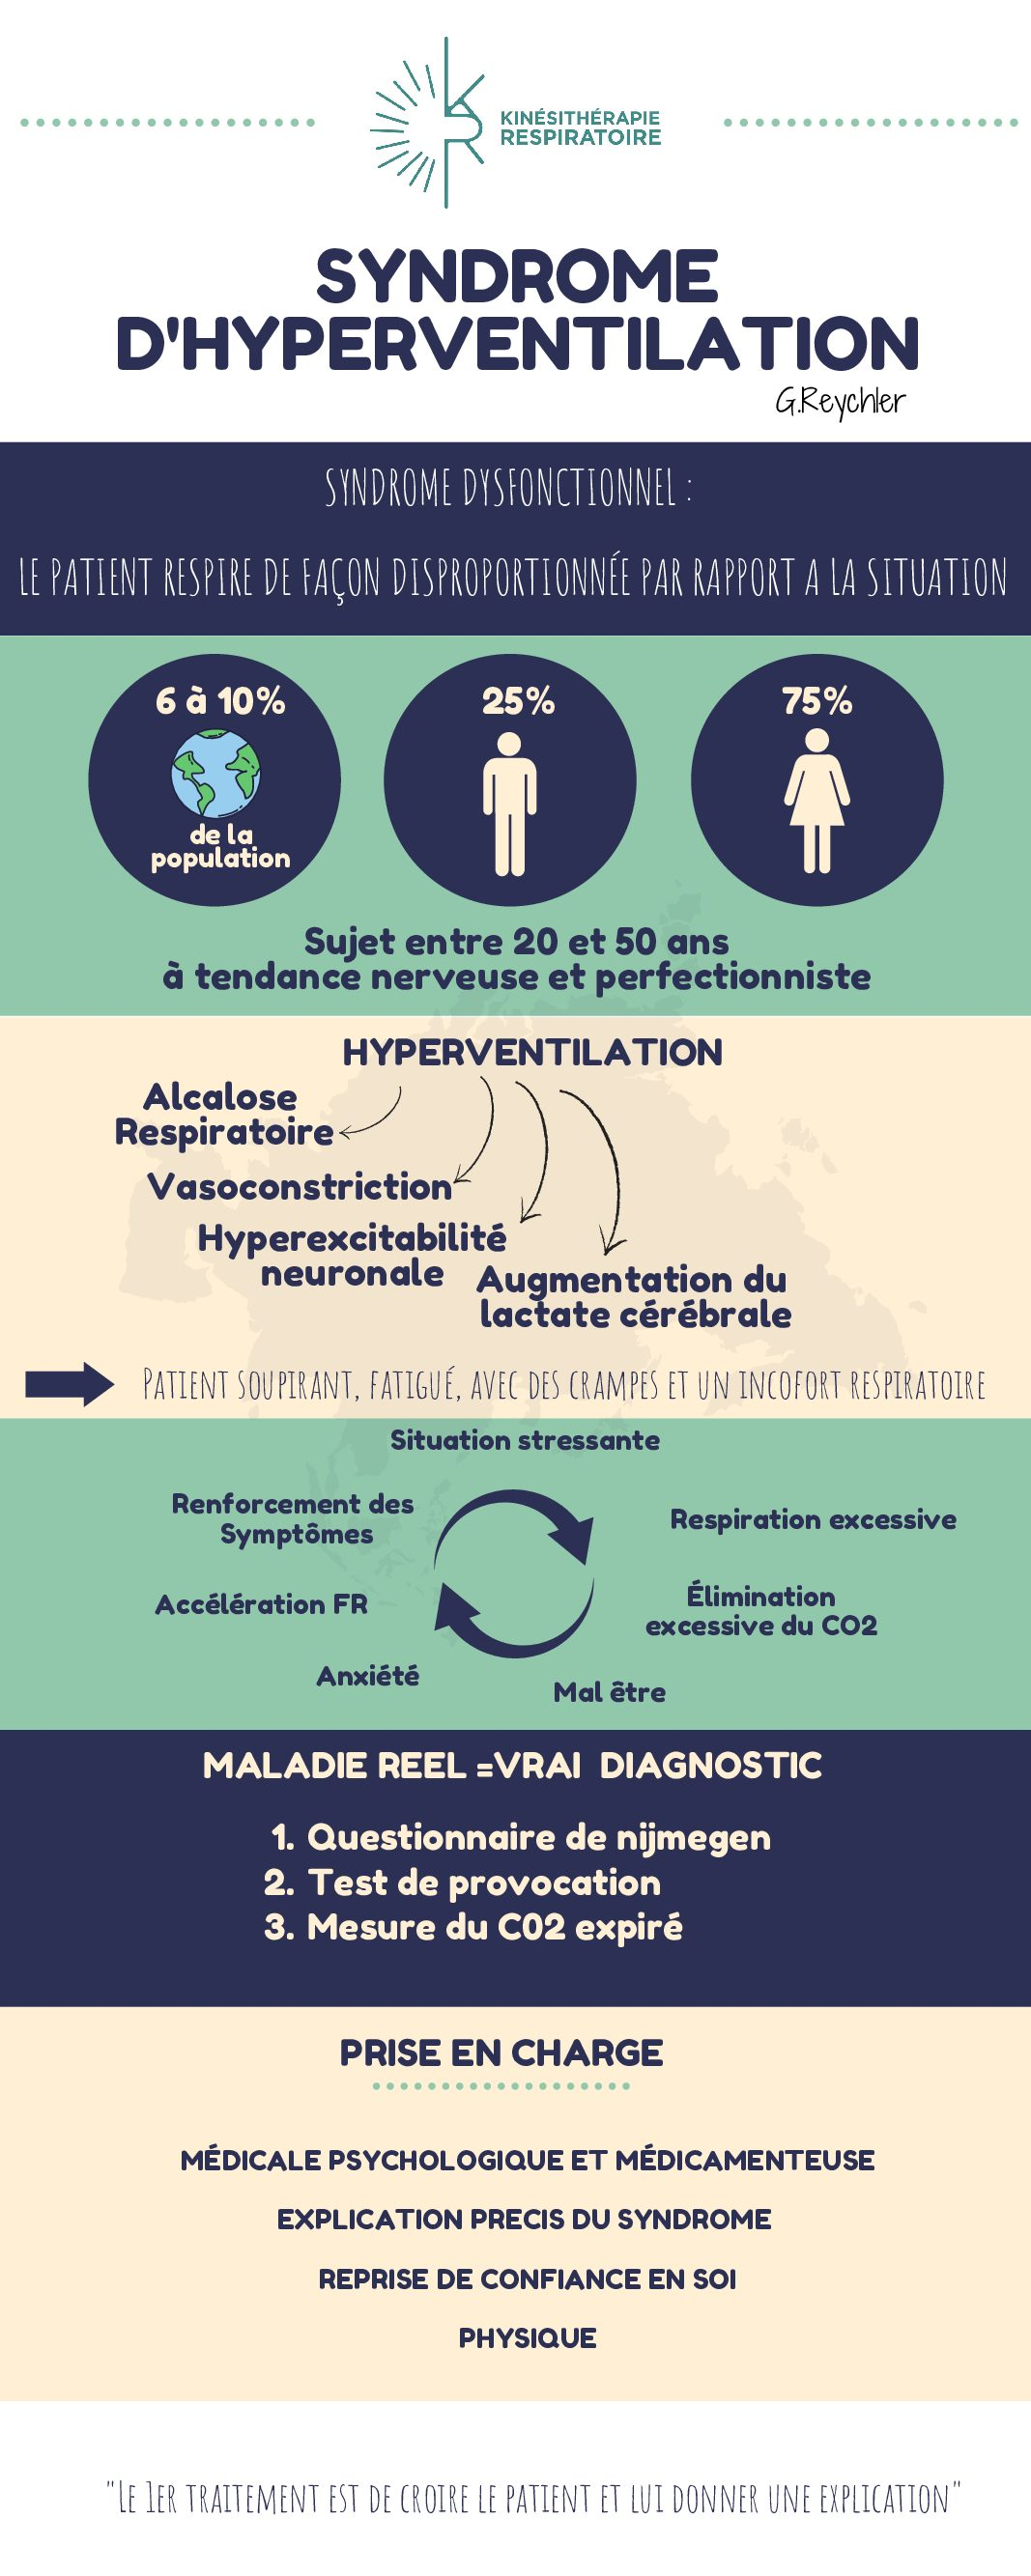 Syndrome d'hyperventilation – Présentation de Gregory Reychler